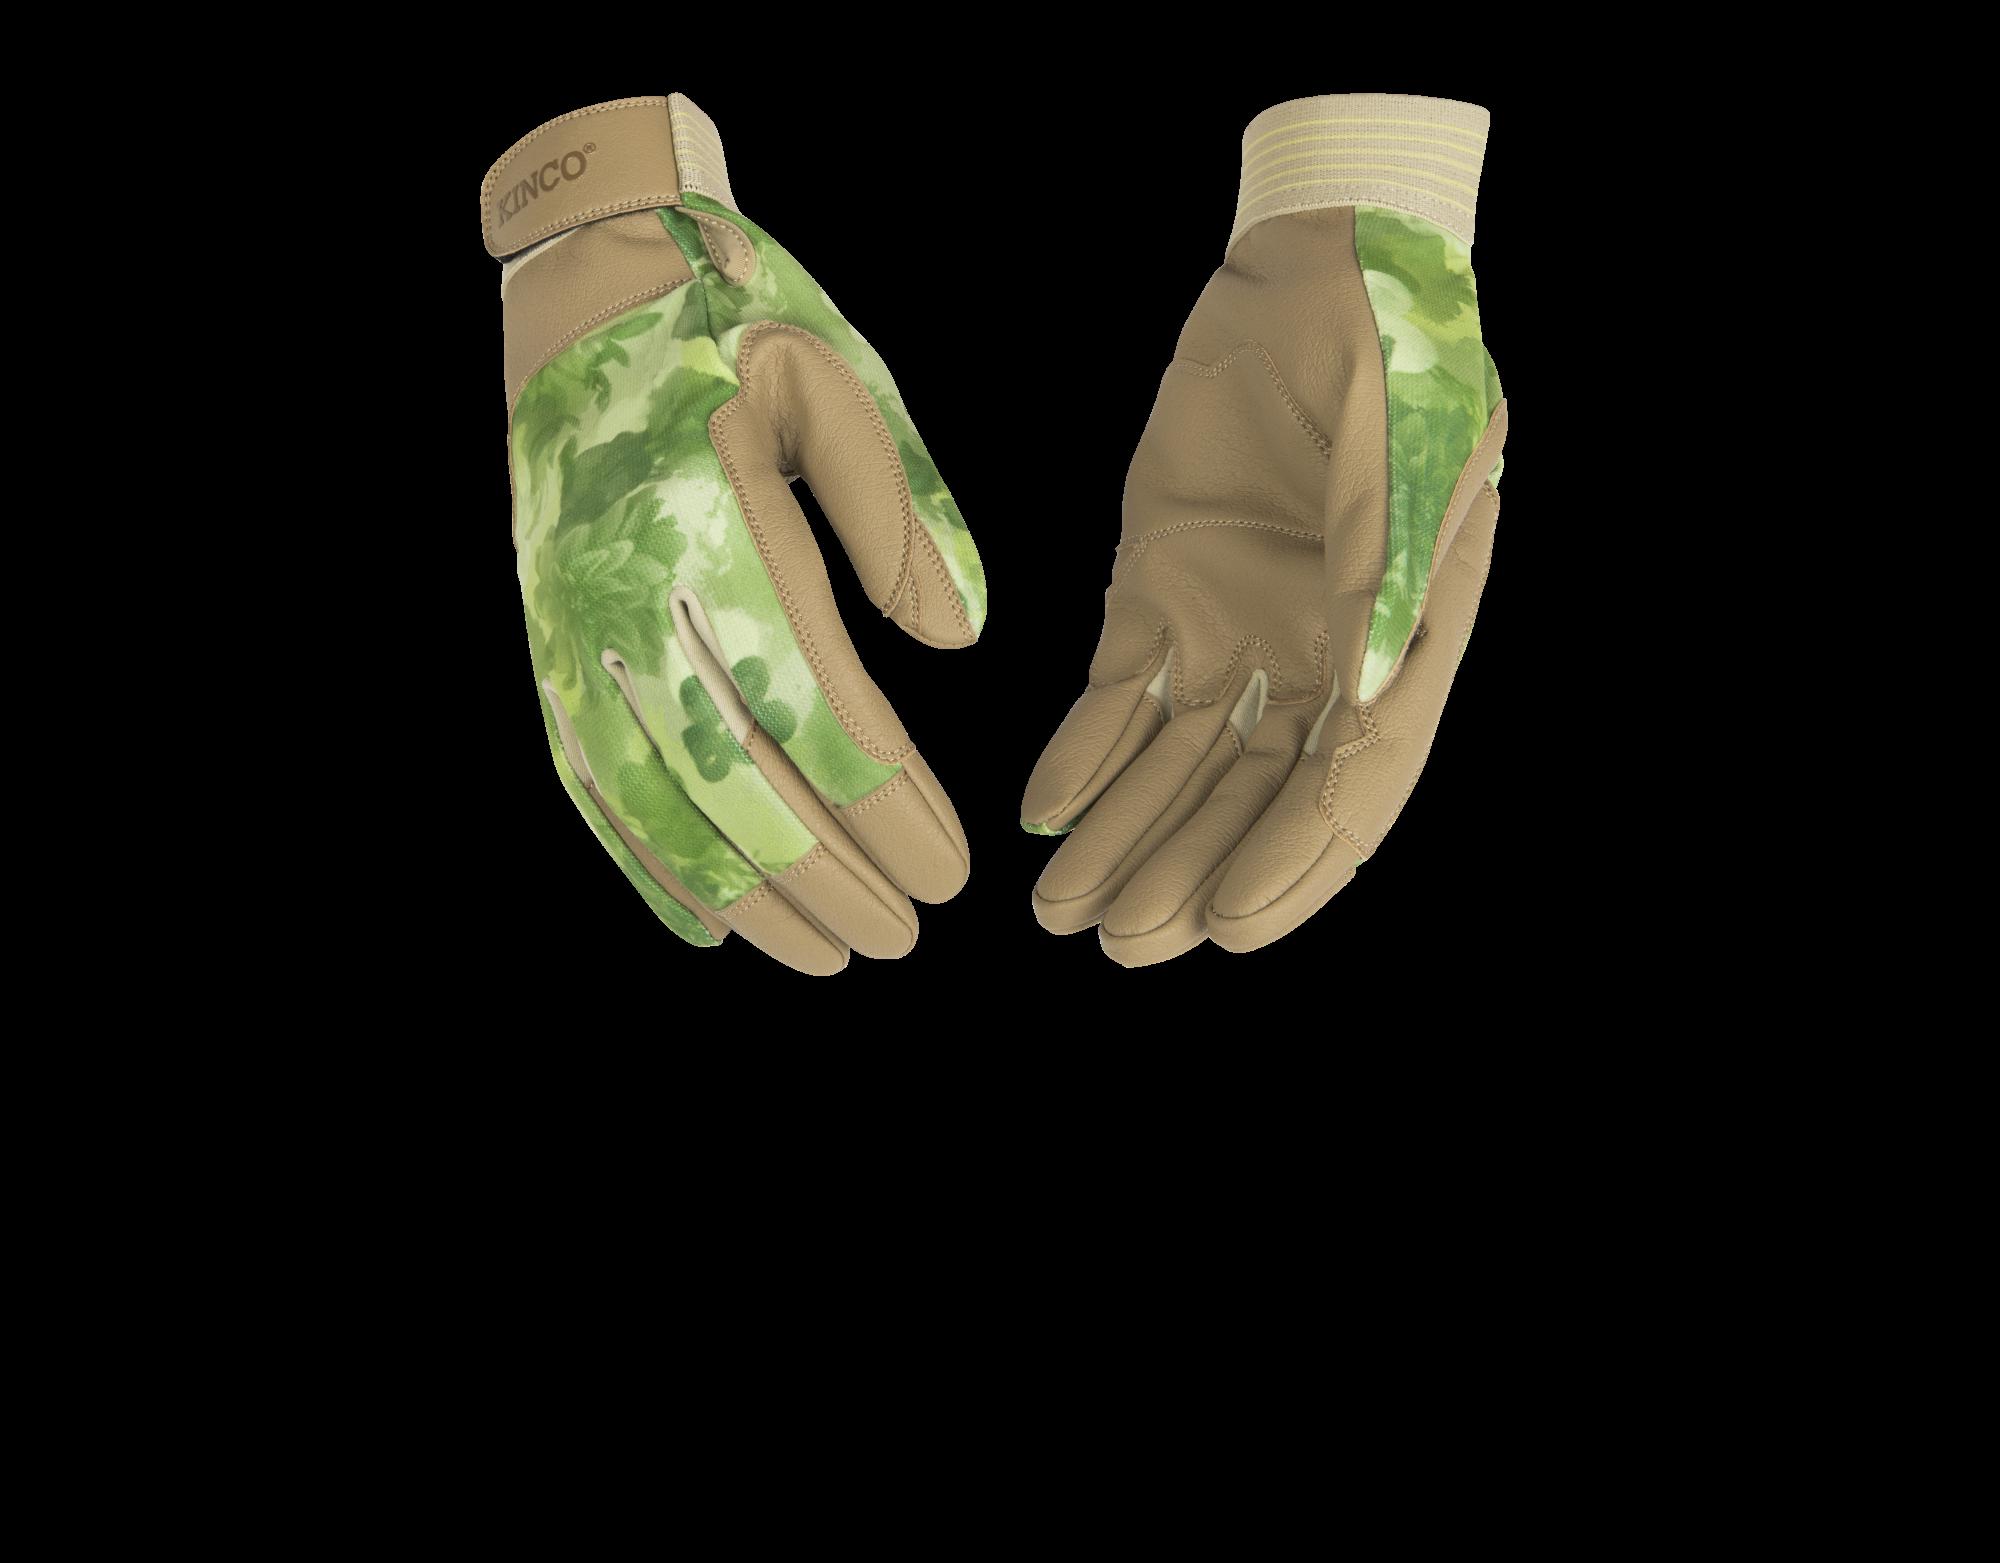 W's KincoPro Palm Wrist Pull Garden Glove 2002W